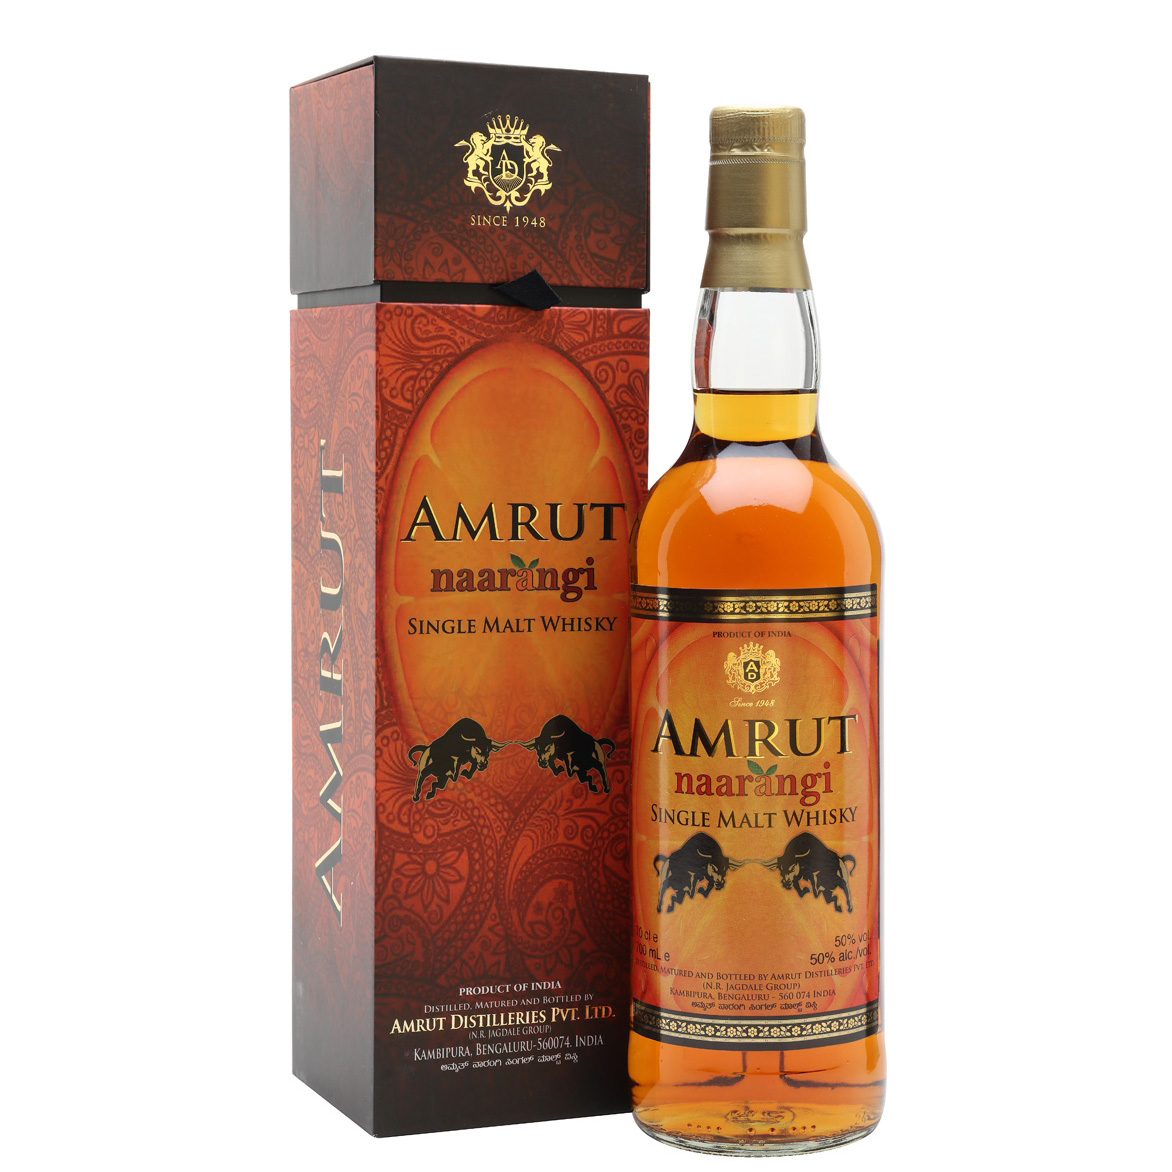 Amrut Naarangi Single Malt Whisky